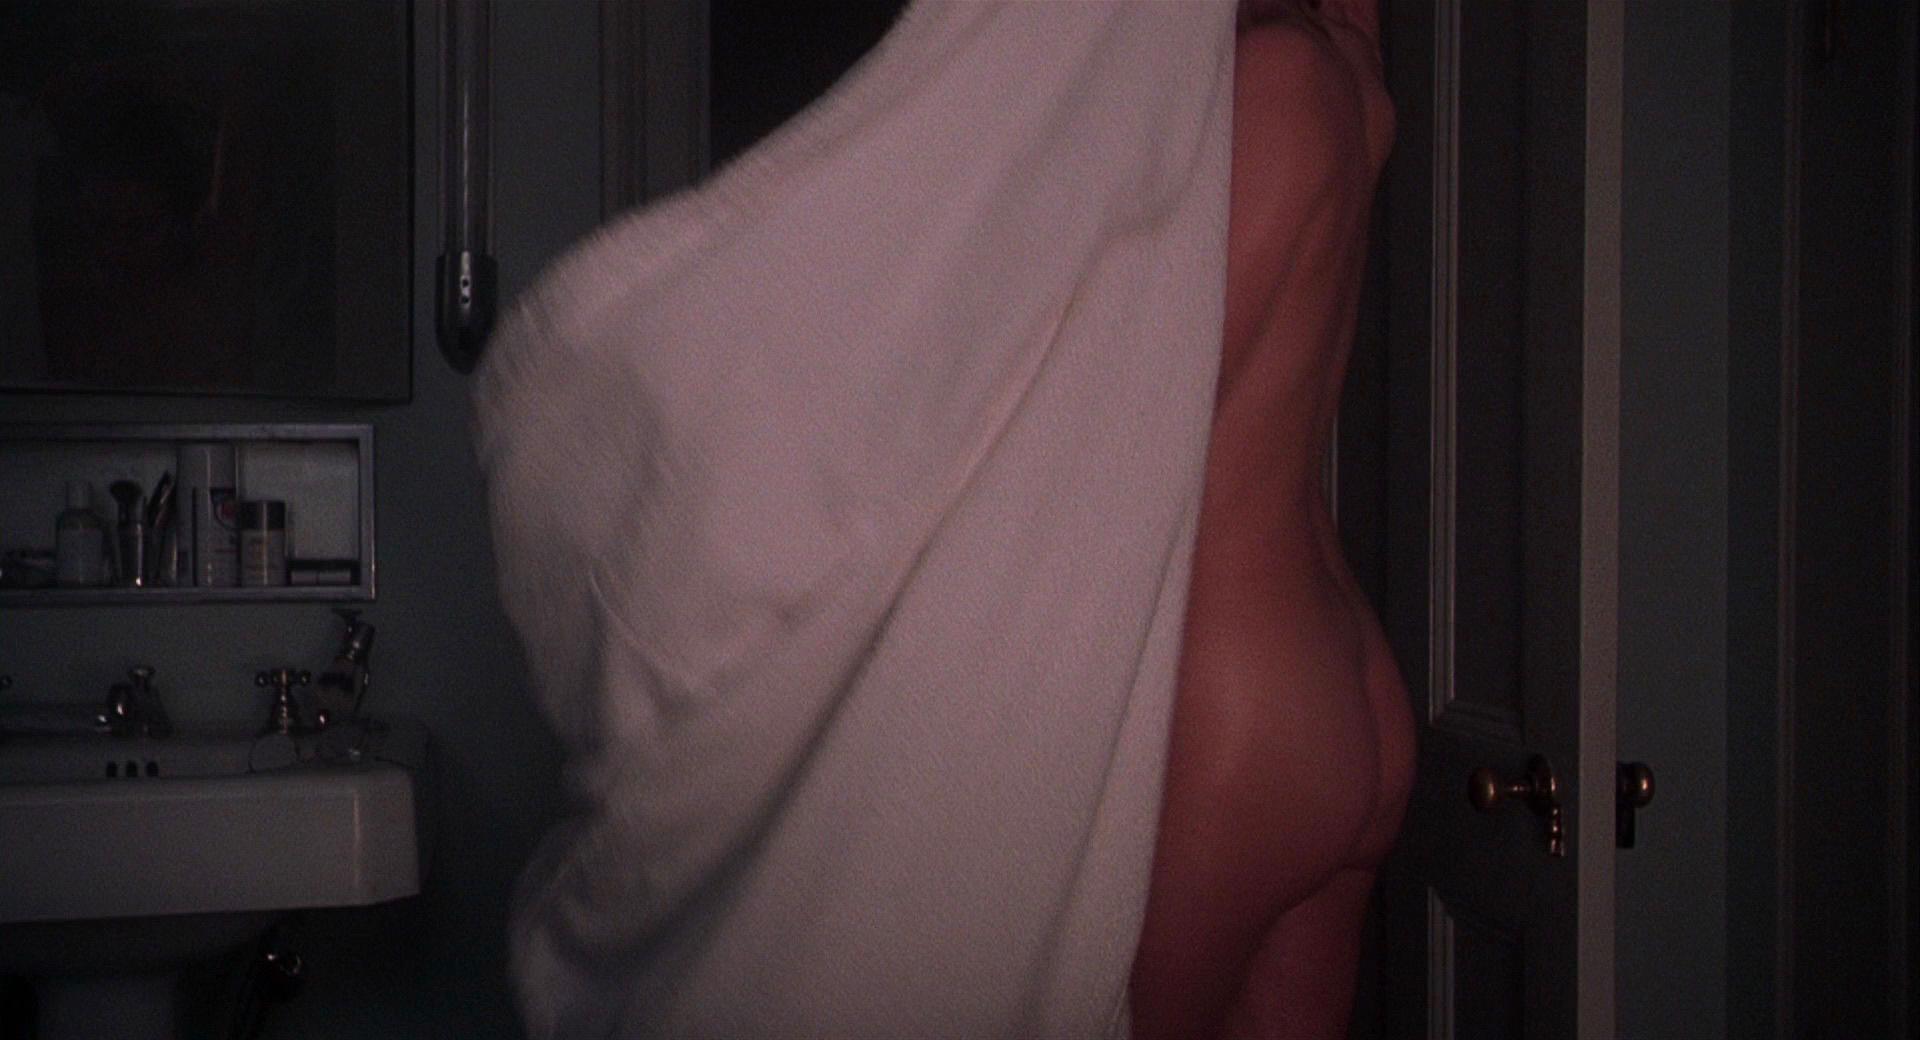 Nude Anamation